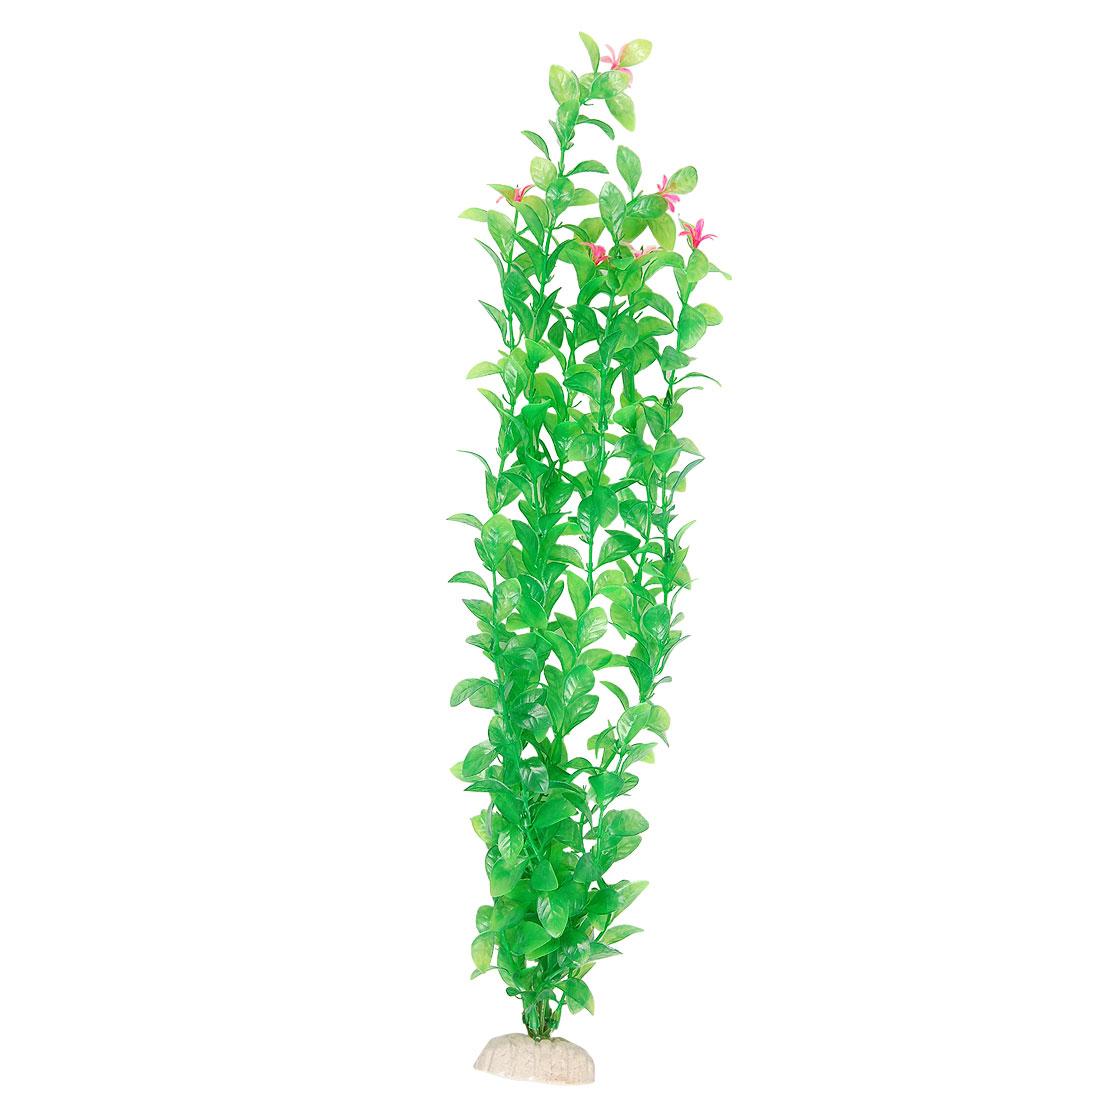 Aquarium Aquascaping Hot Pink Flower Green Leaf Plastic Plant Decor